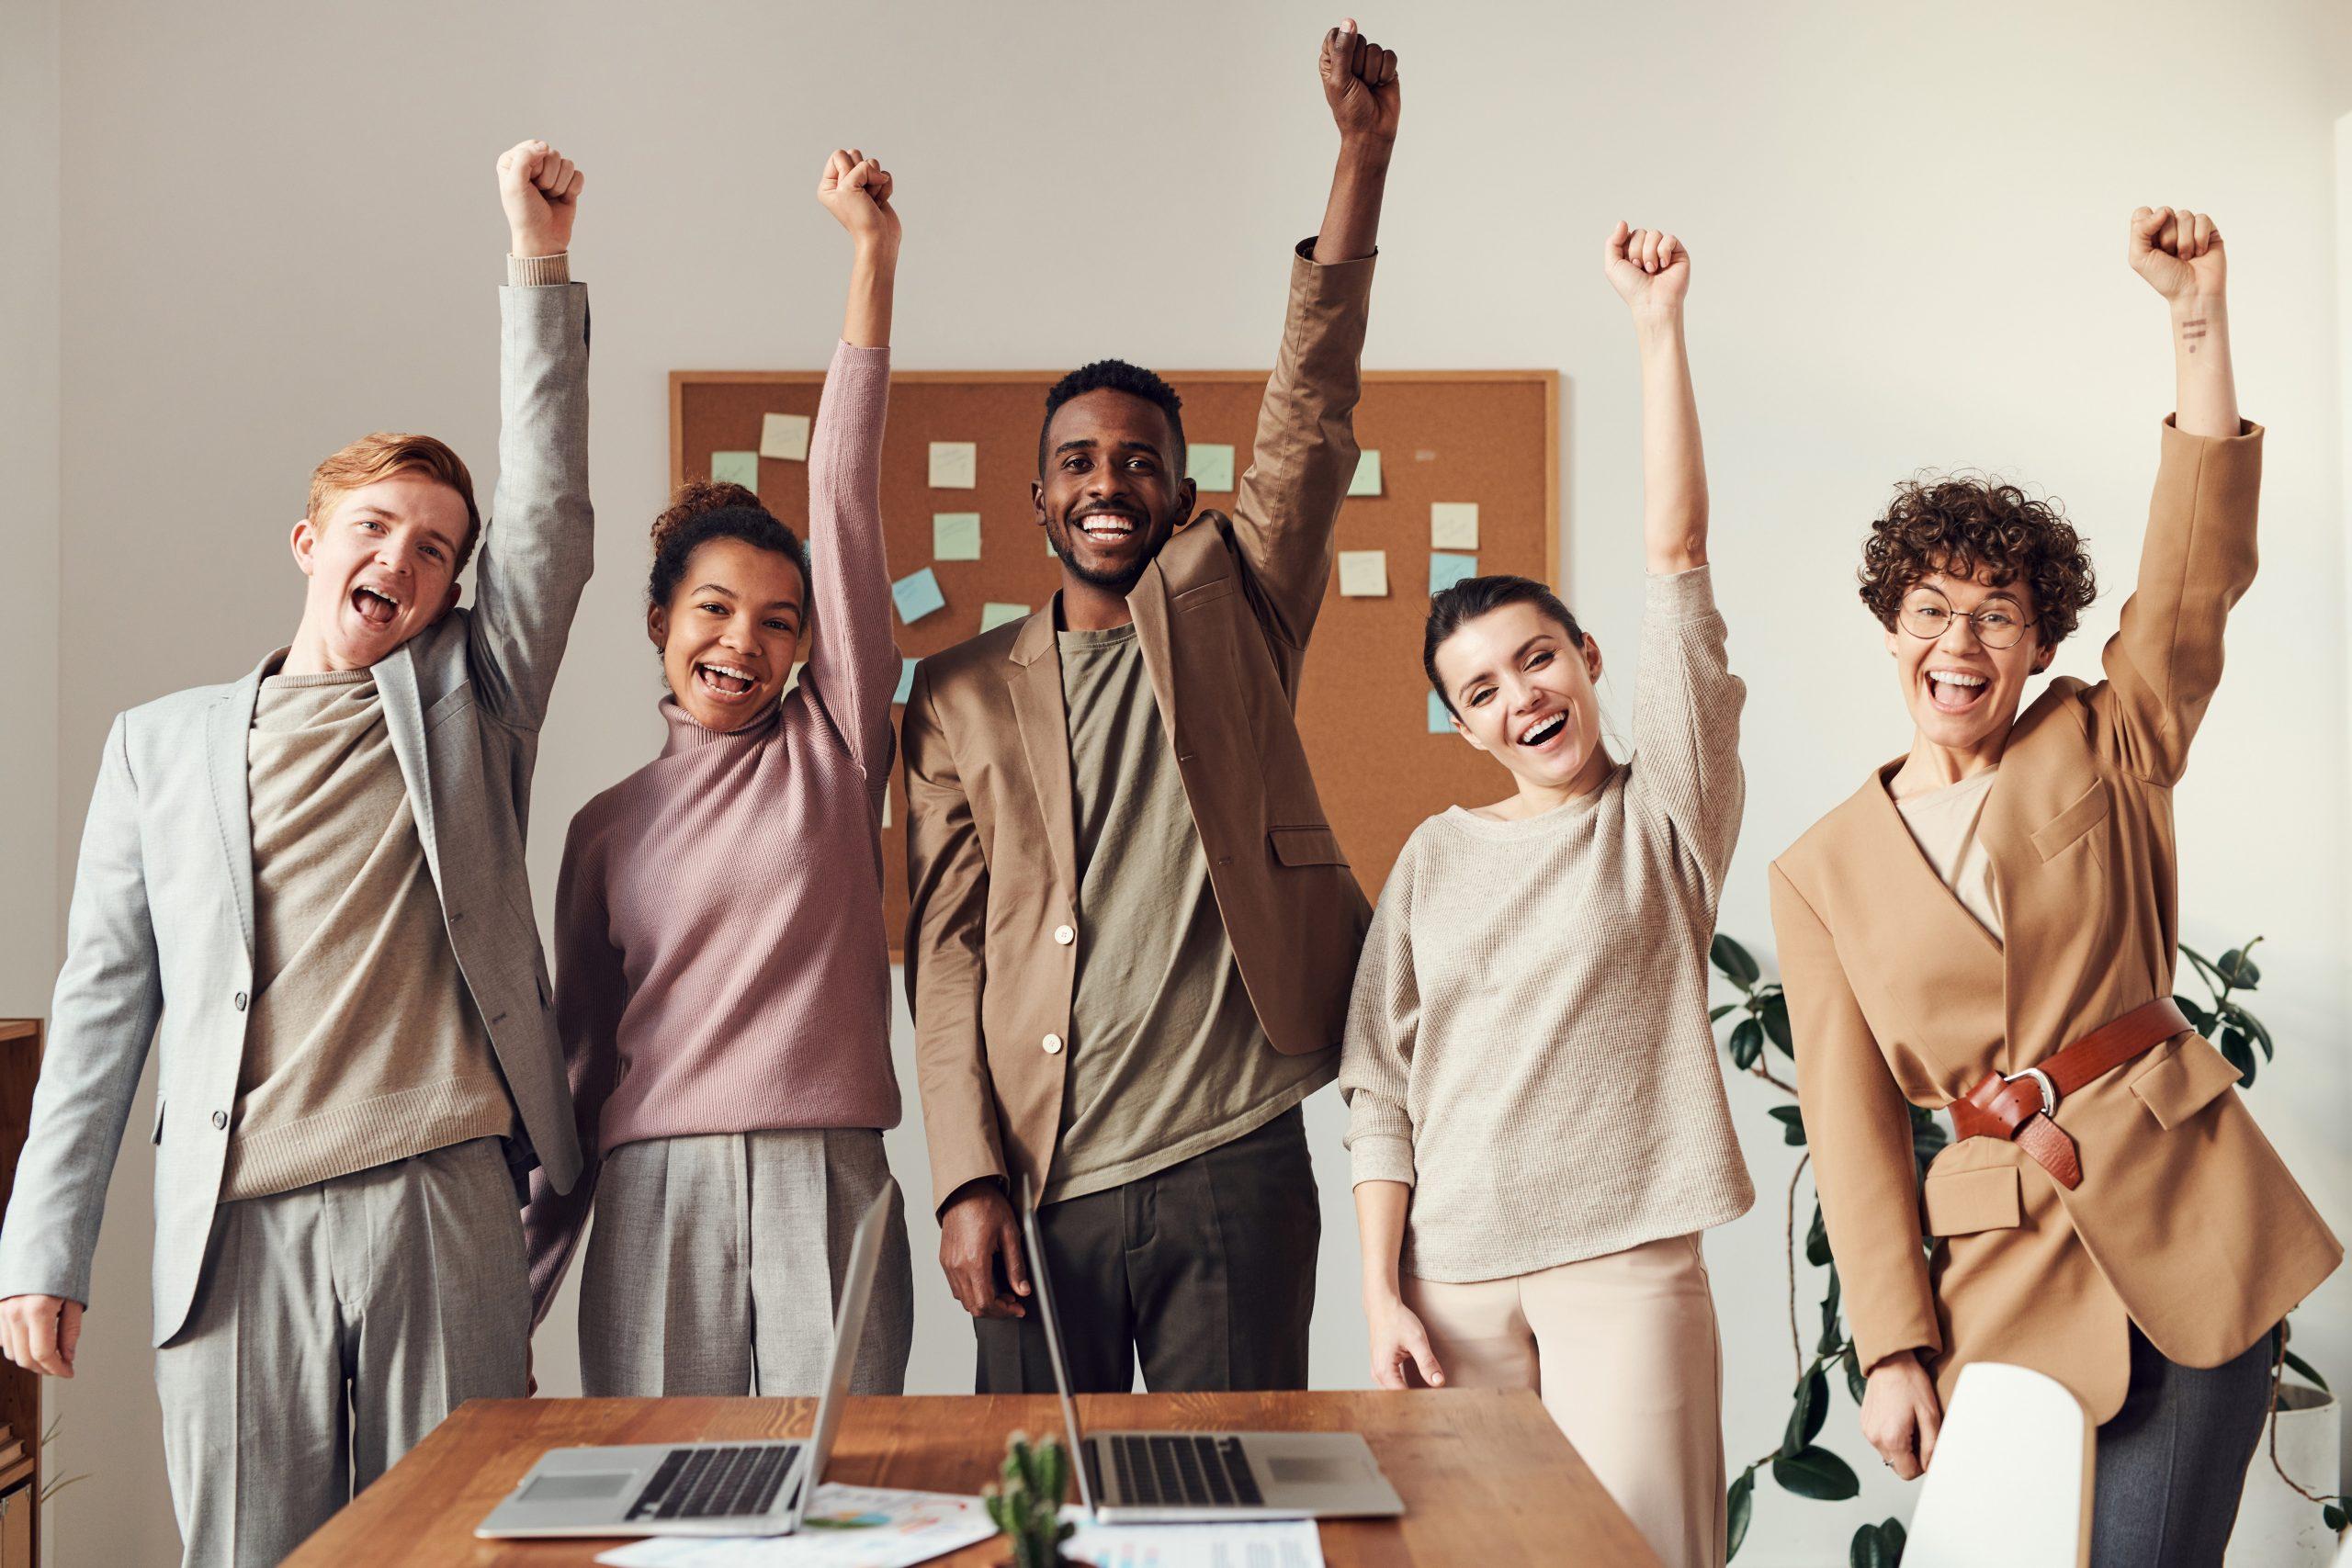 groupe travail lève la main enthousiasme